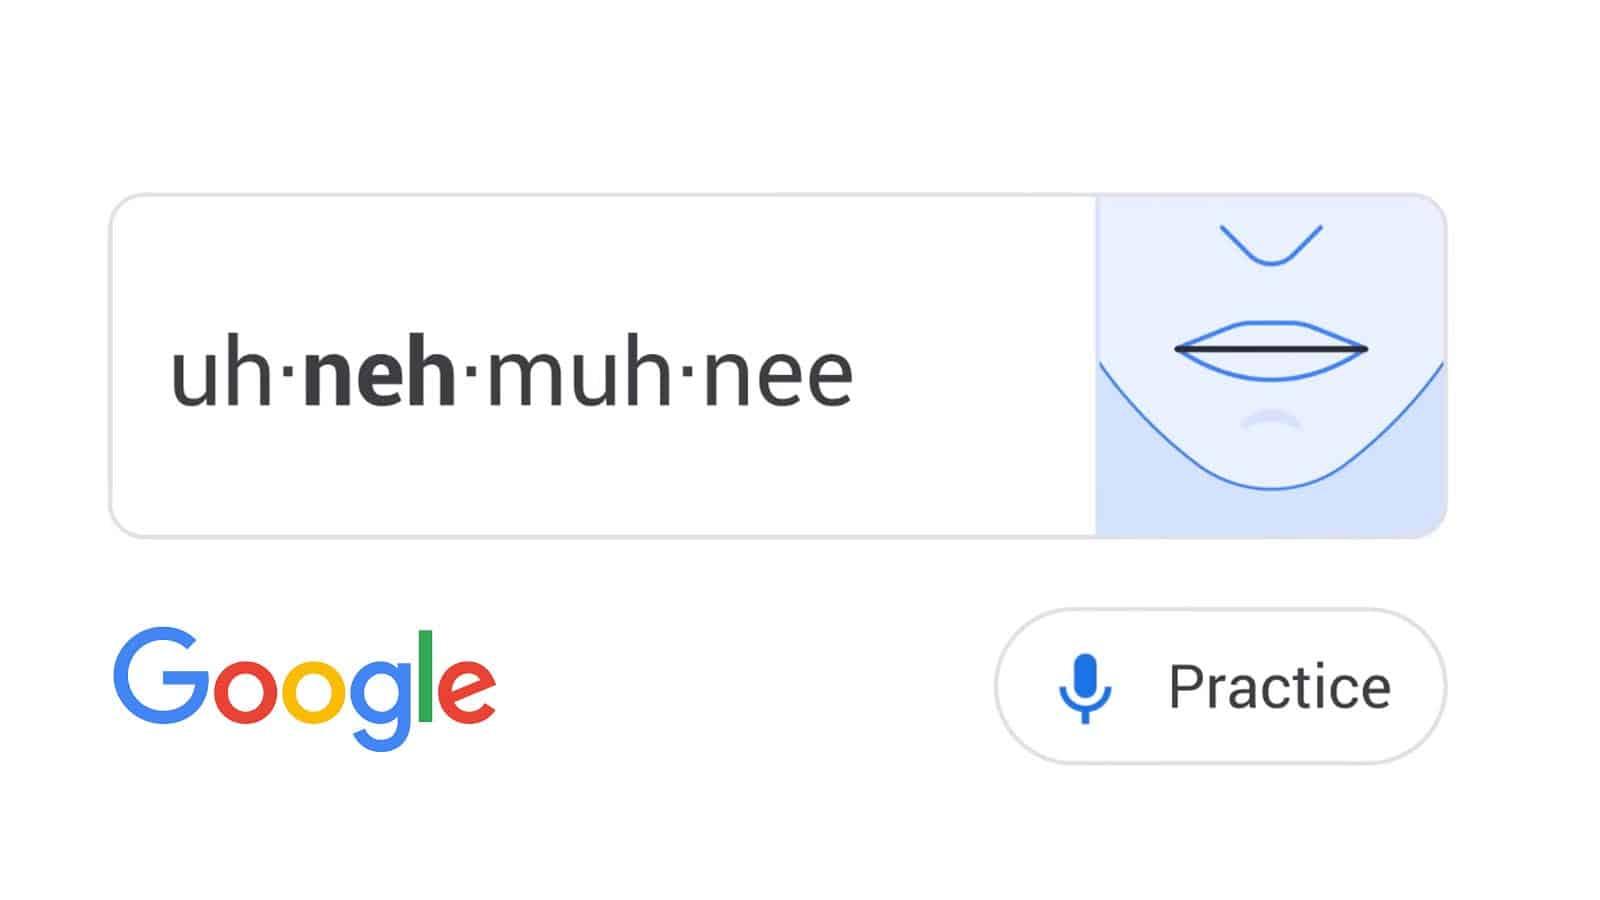 google speech tools on search